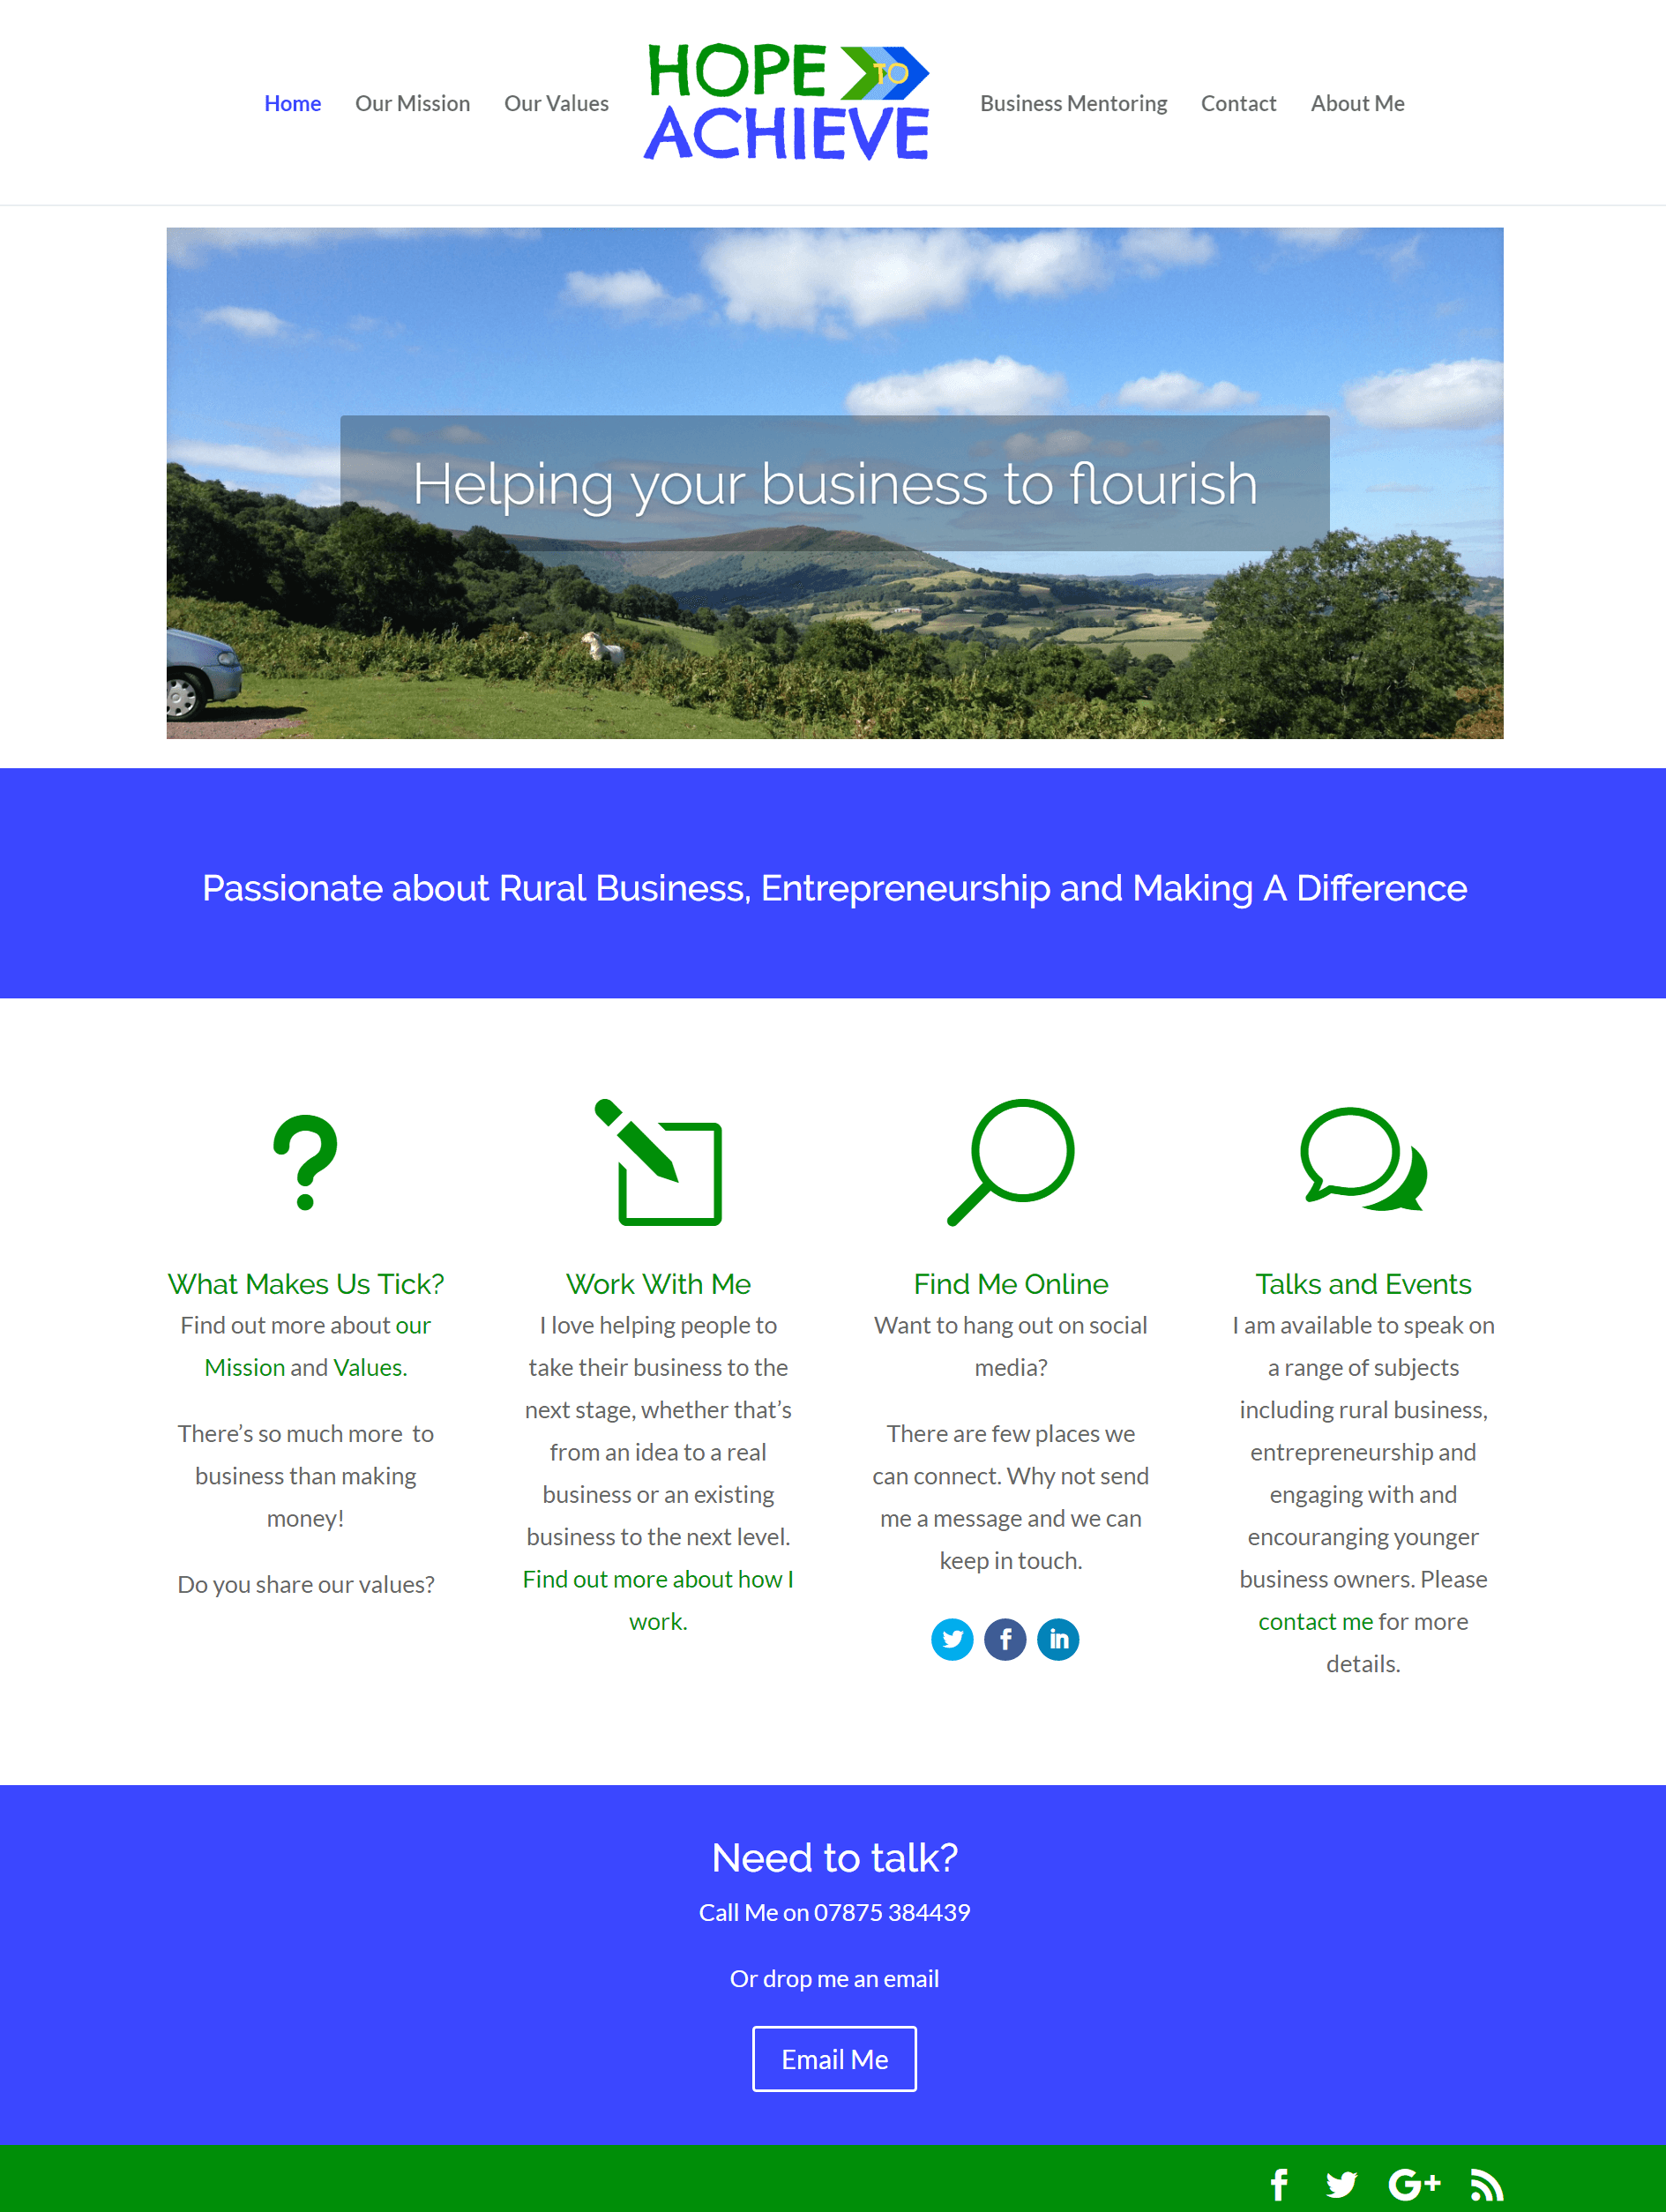 Hope to achieve website